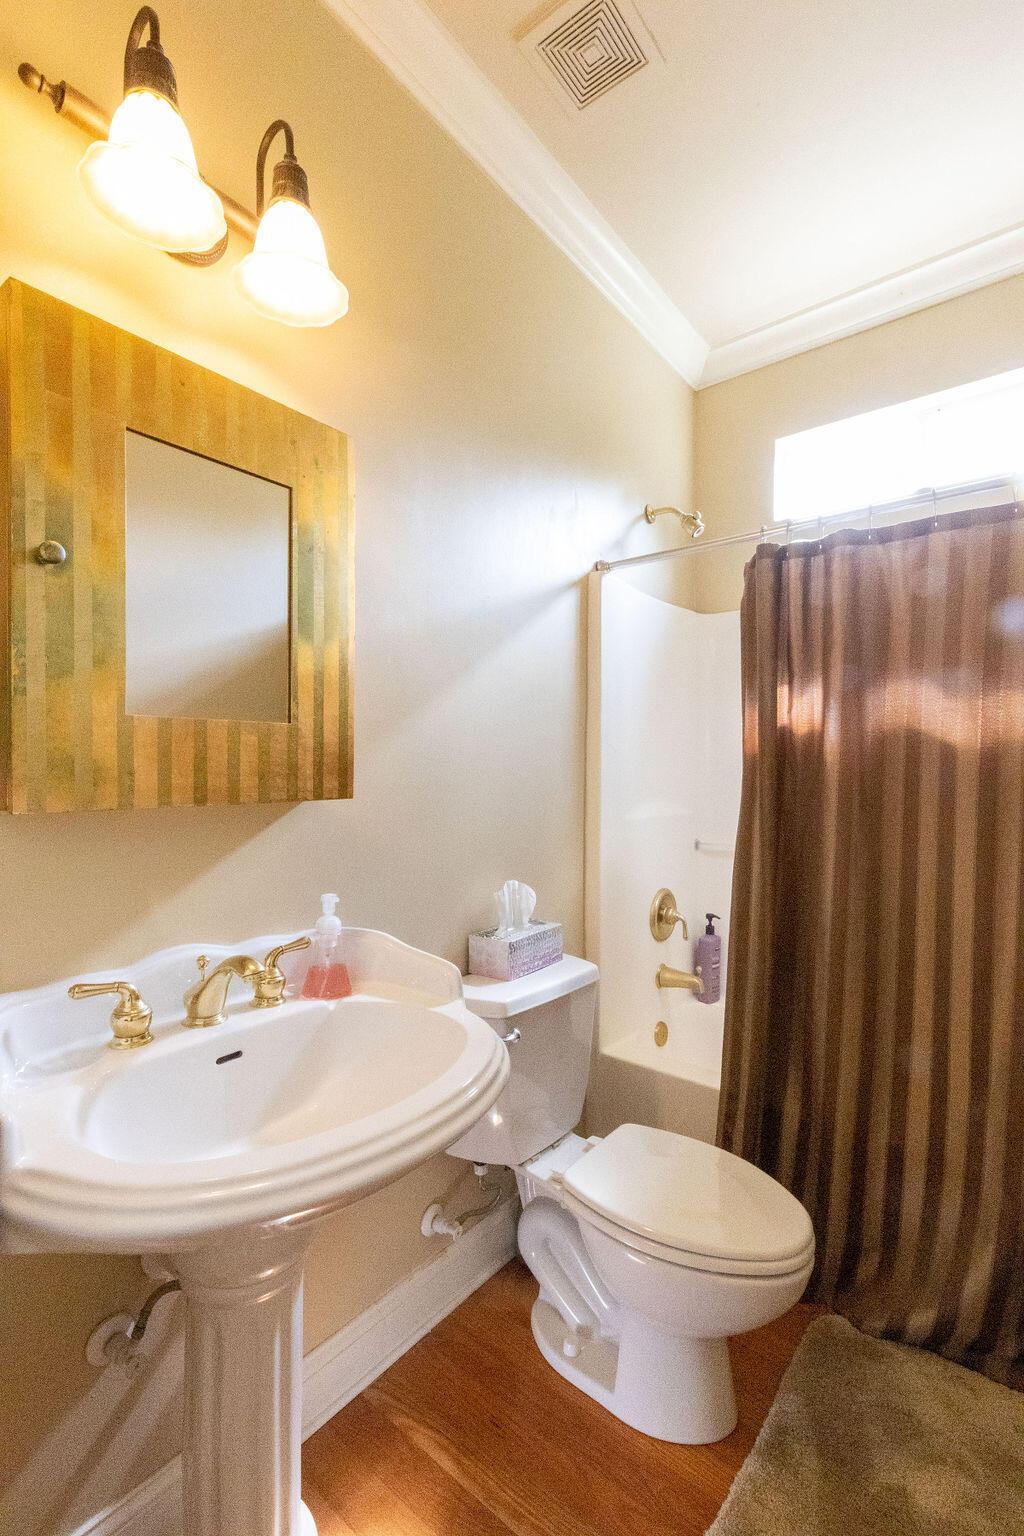 Dunes West Homes For Sale - 1220 Darts Cove, Mount Pleasant, SC - 42